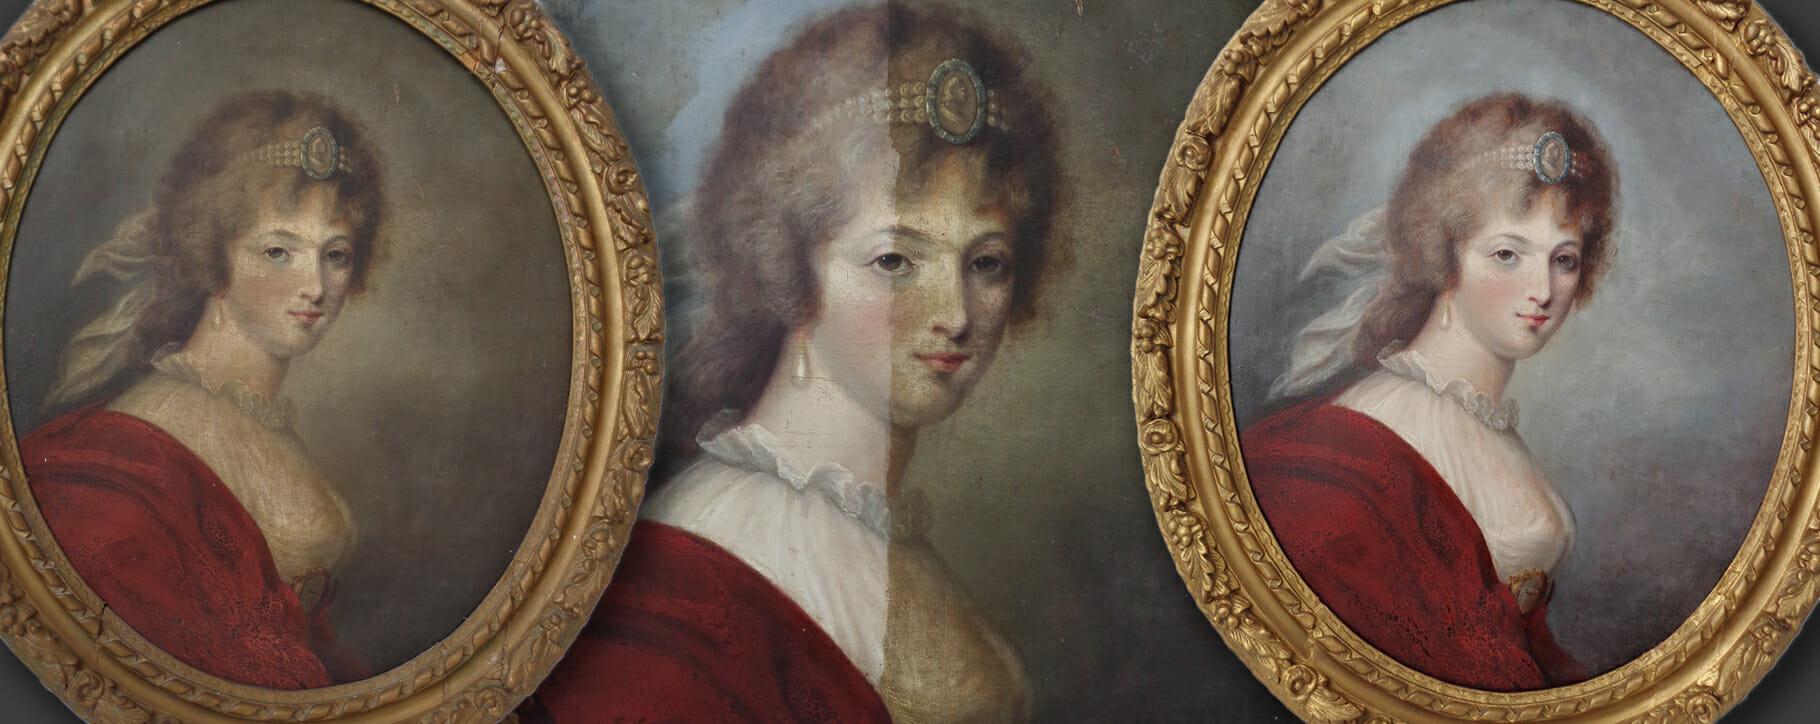 18th century Varnish Removal oval